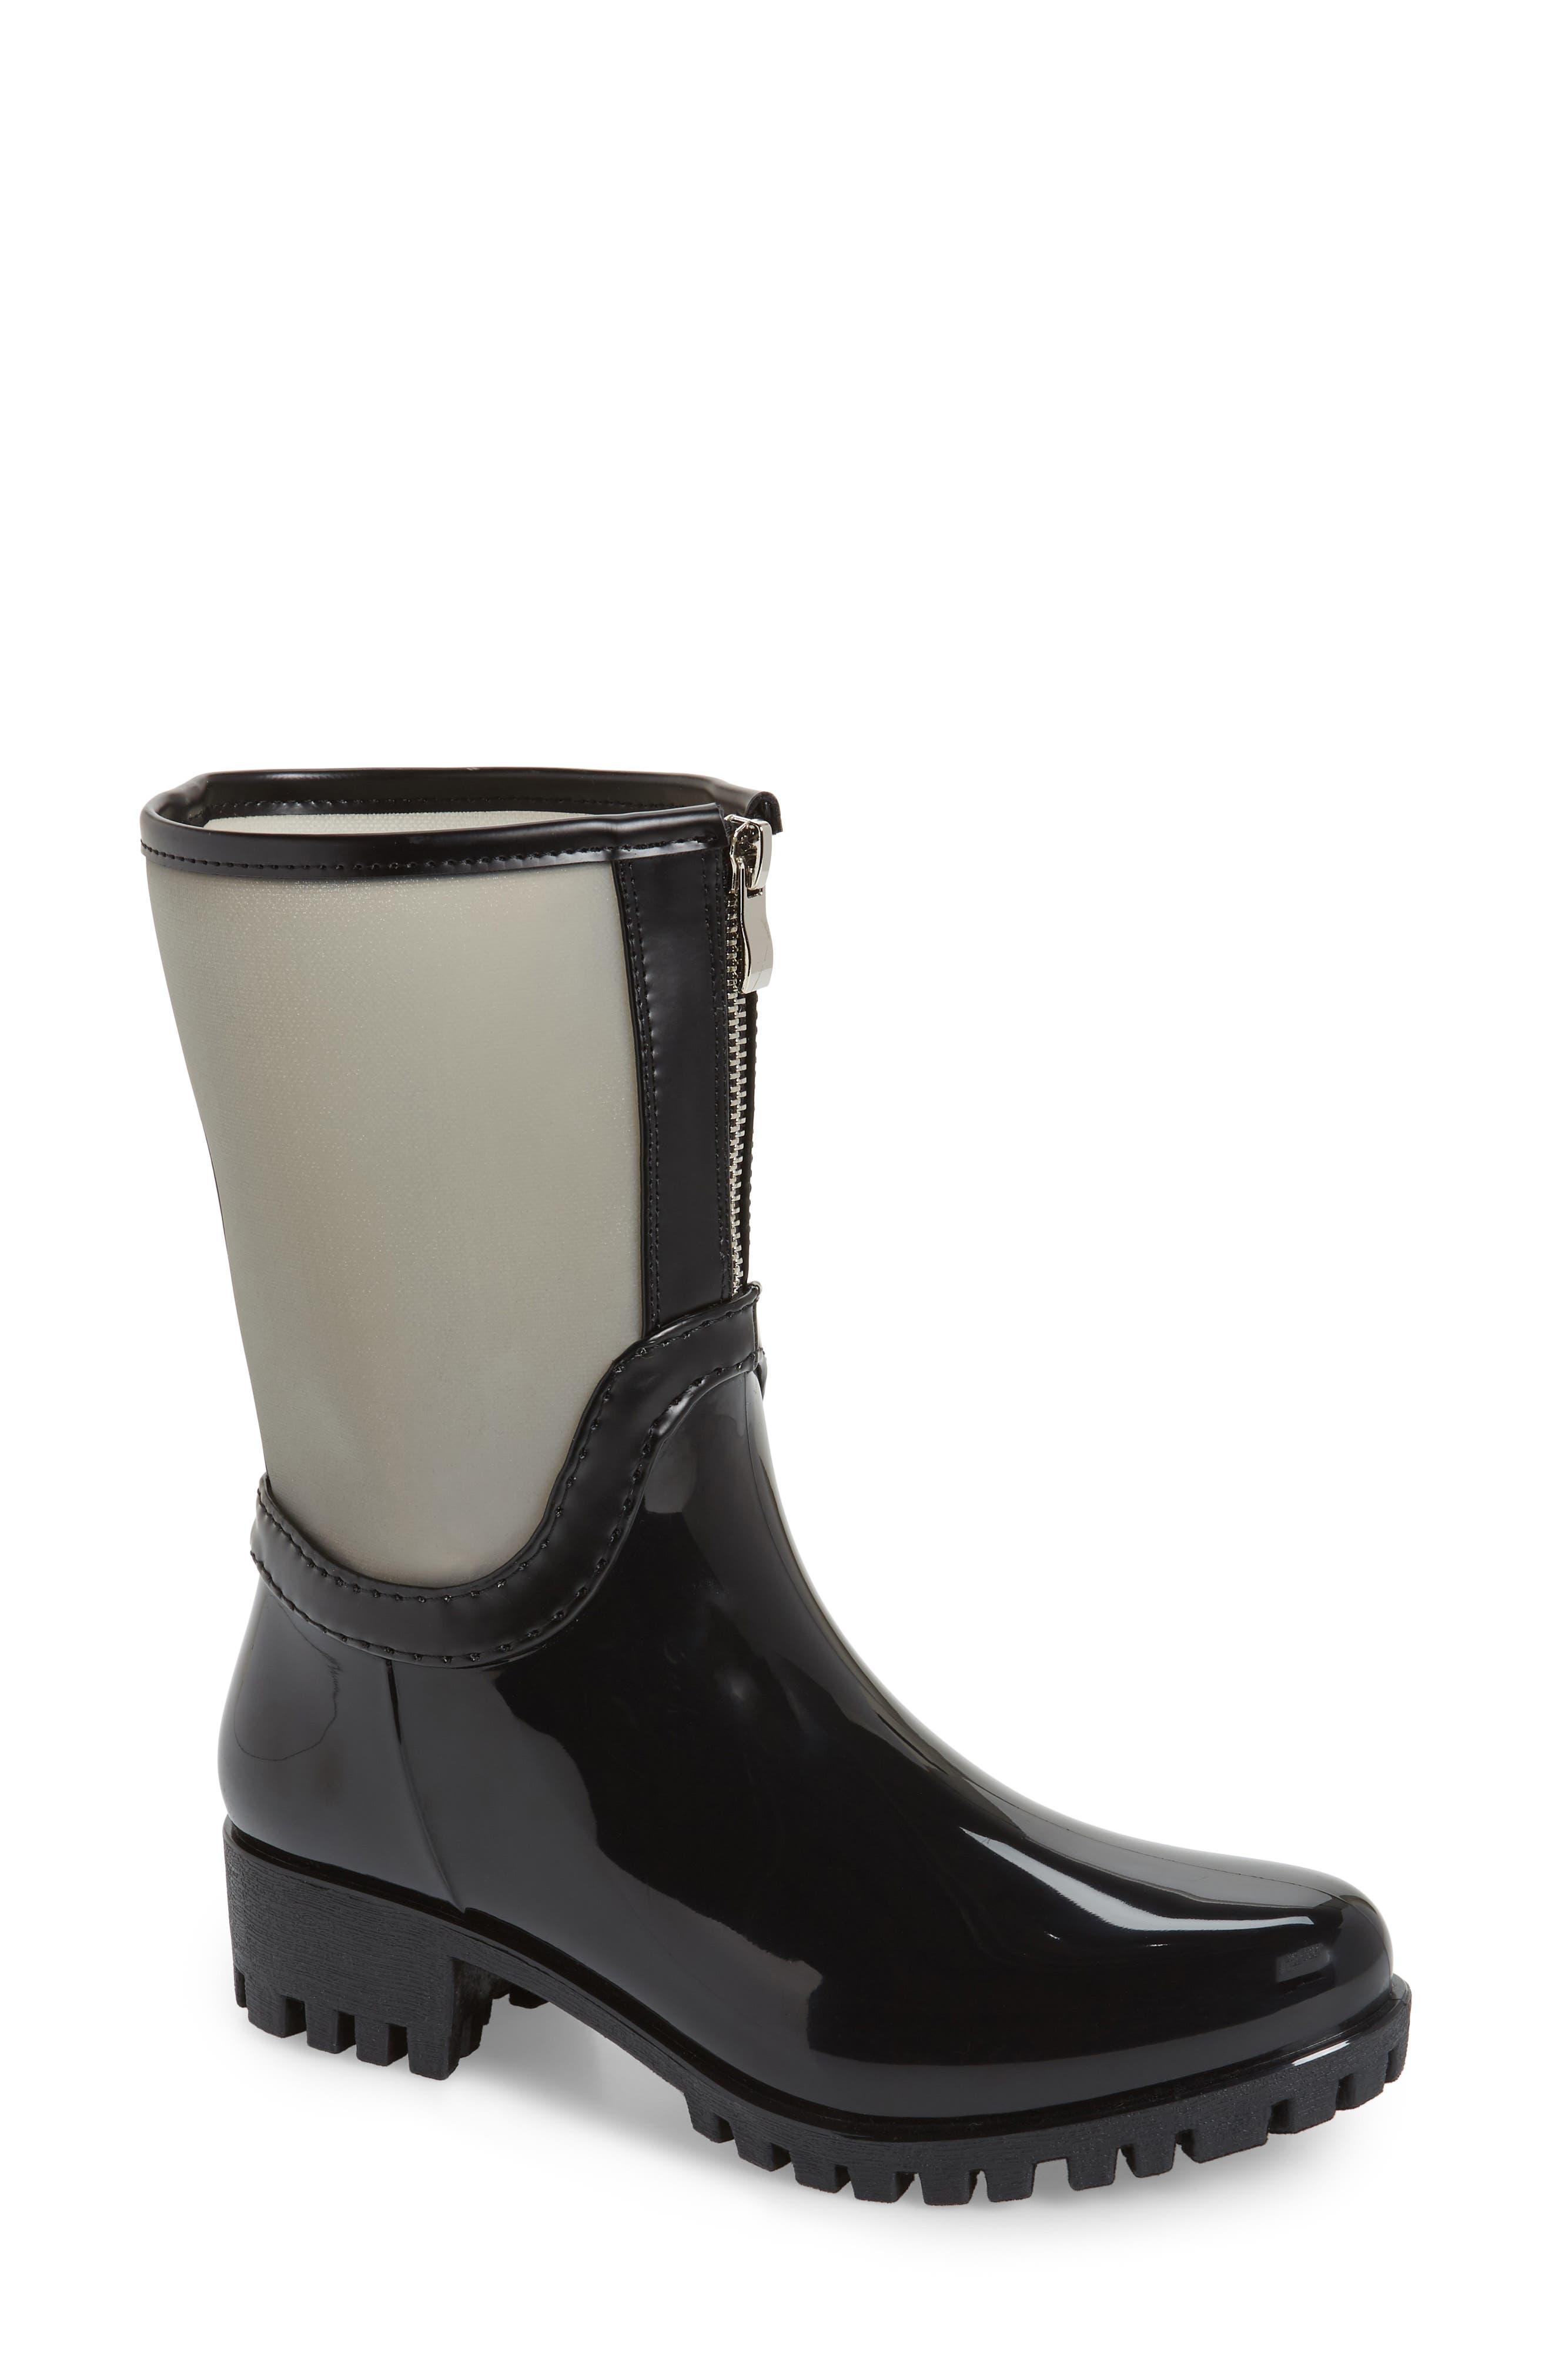 DÄV, Dryden Sheer Waterproof Boot, Main thumbnail 1, color, GREY FABRIC